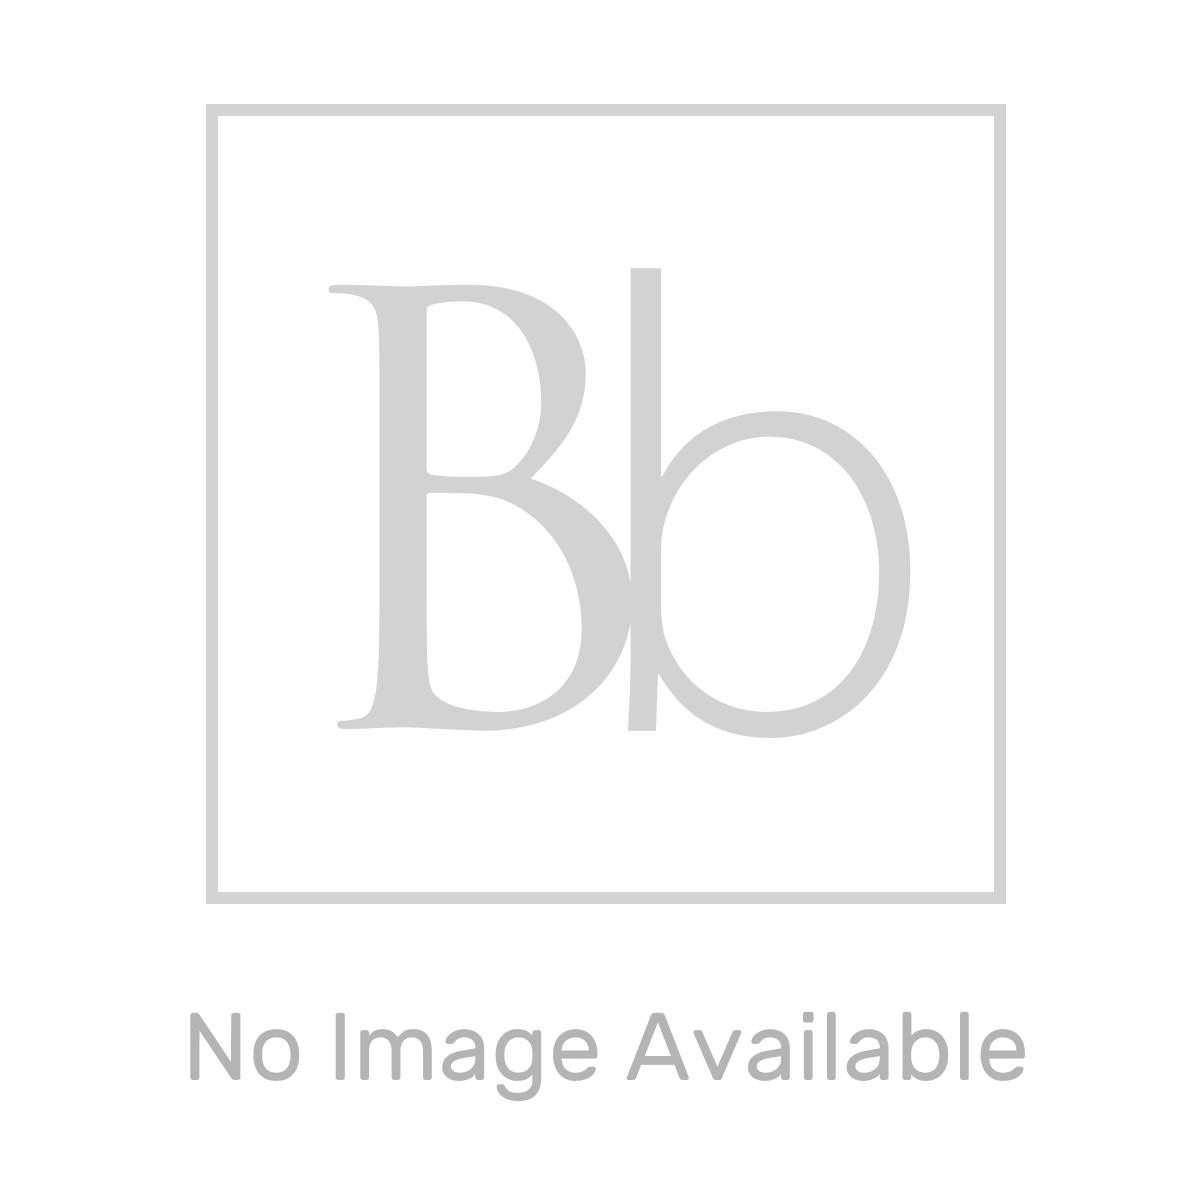 Aquadart Quadrant 900 x 900 Shower Tray